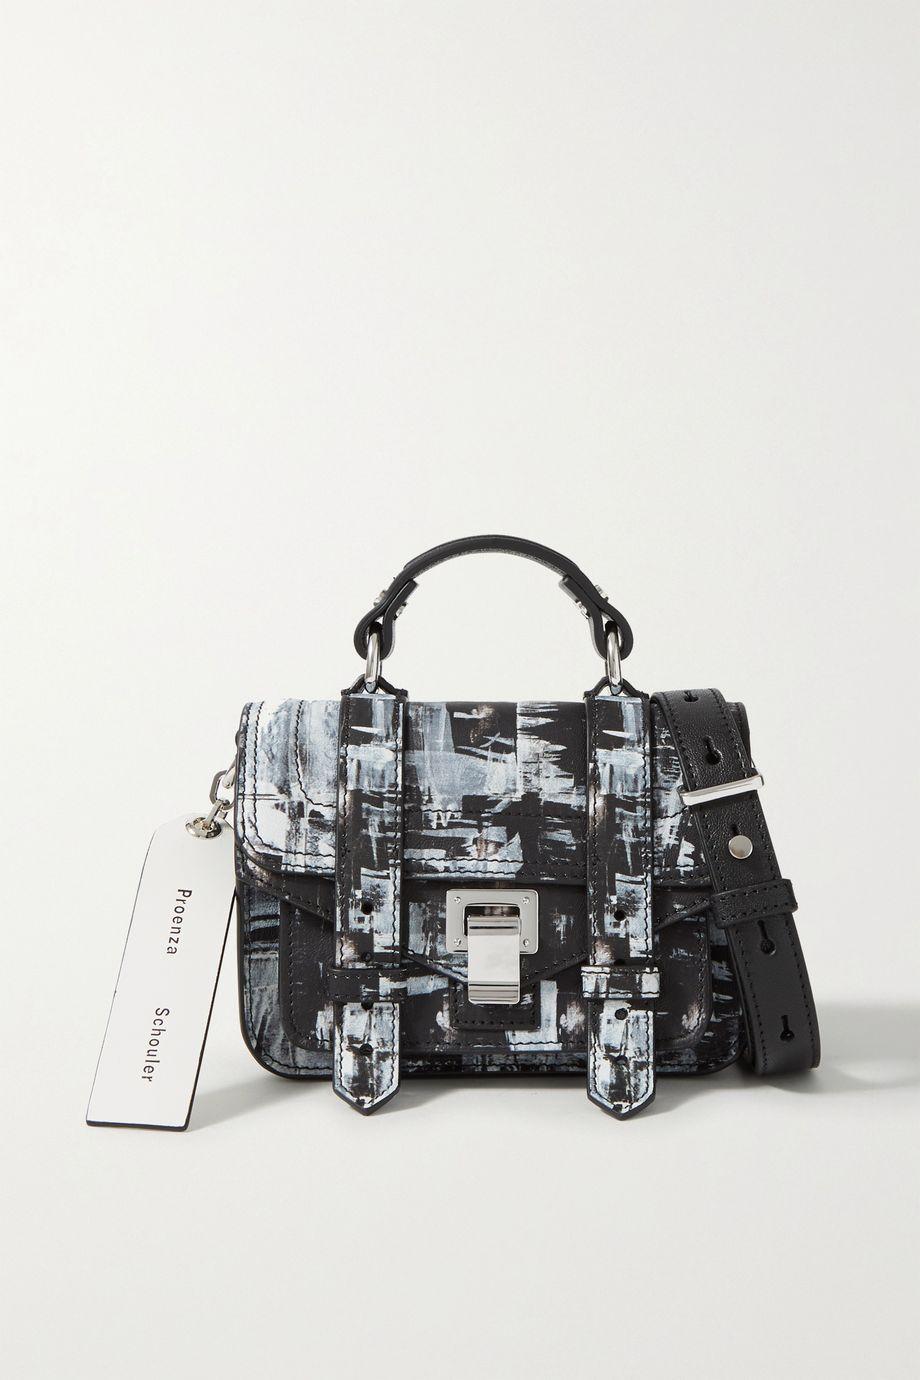 Proenza Schouler + Harmony Korine PS1 micro printed leather shoulder bag